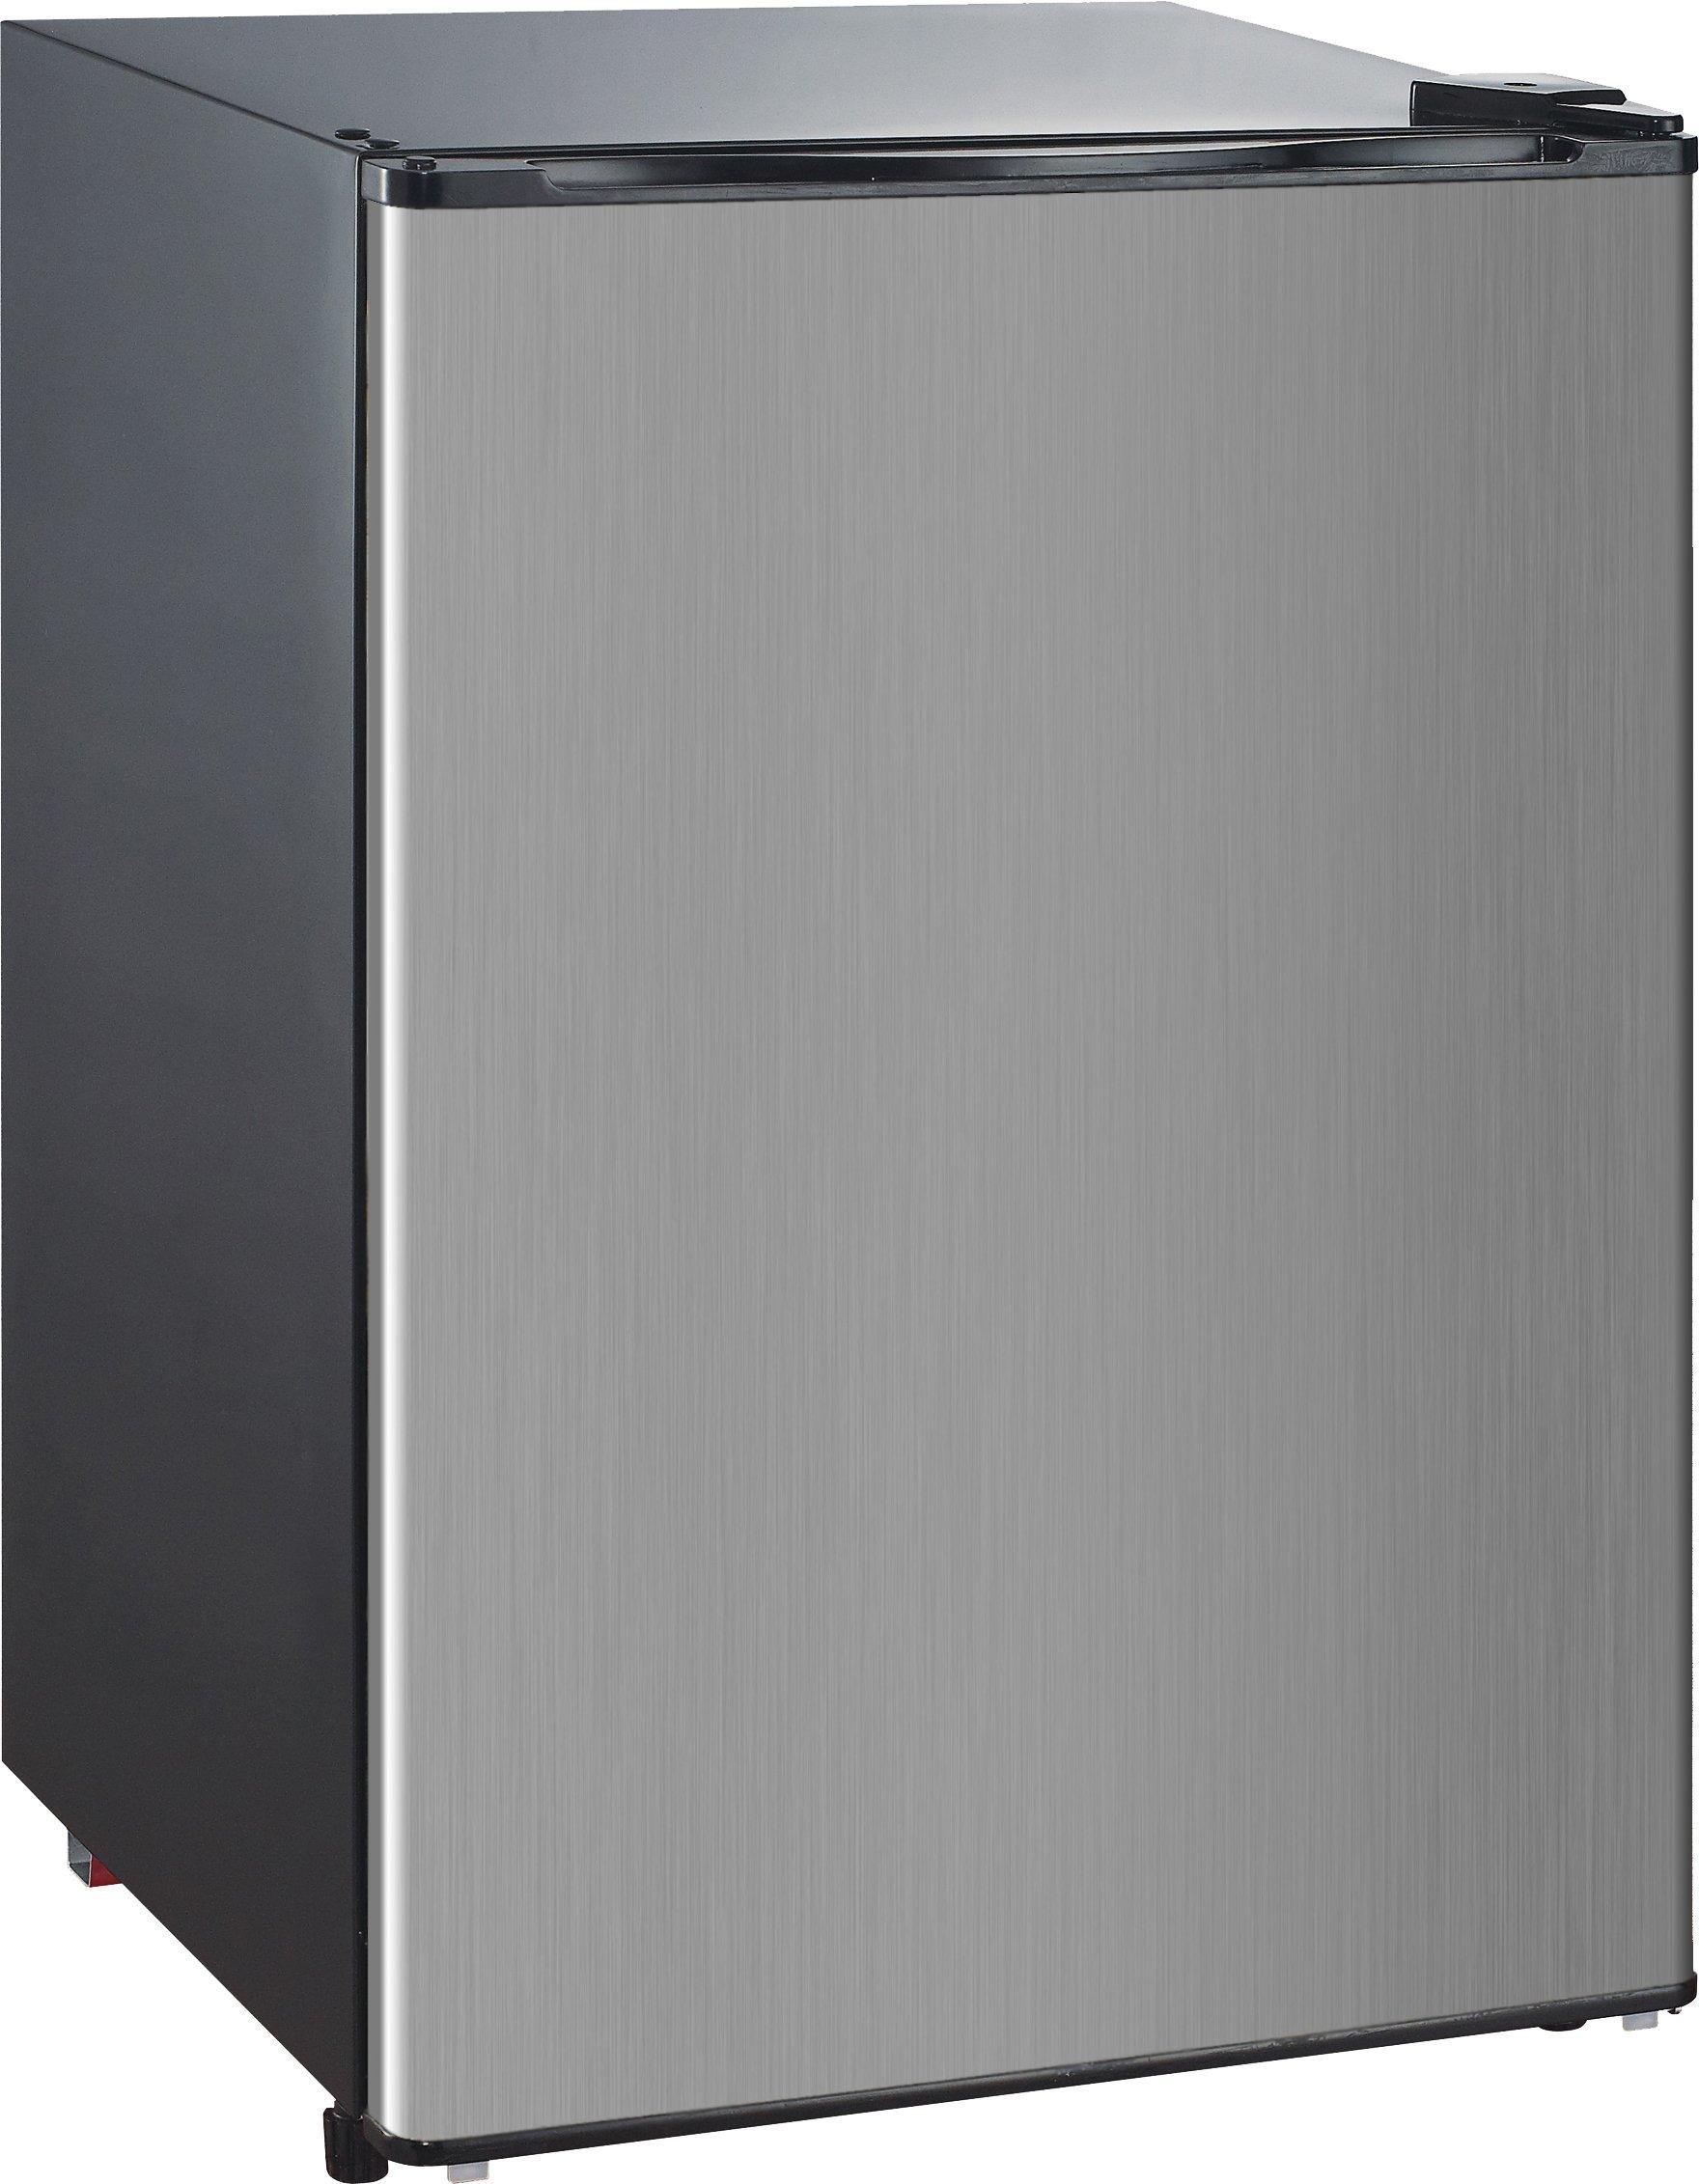 RCA-Igloo 4.5 Cubic Foot Fridge, Stainless Steel